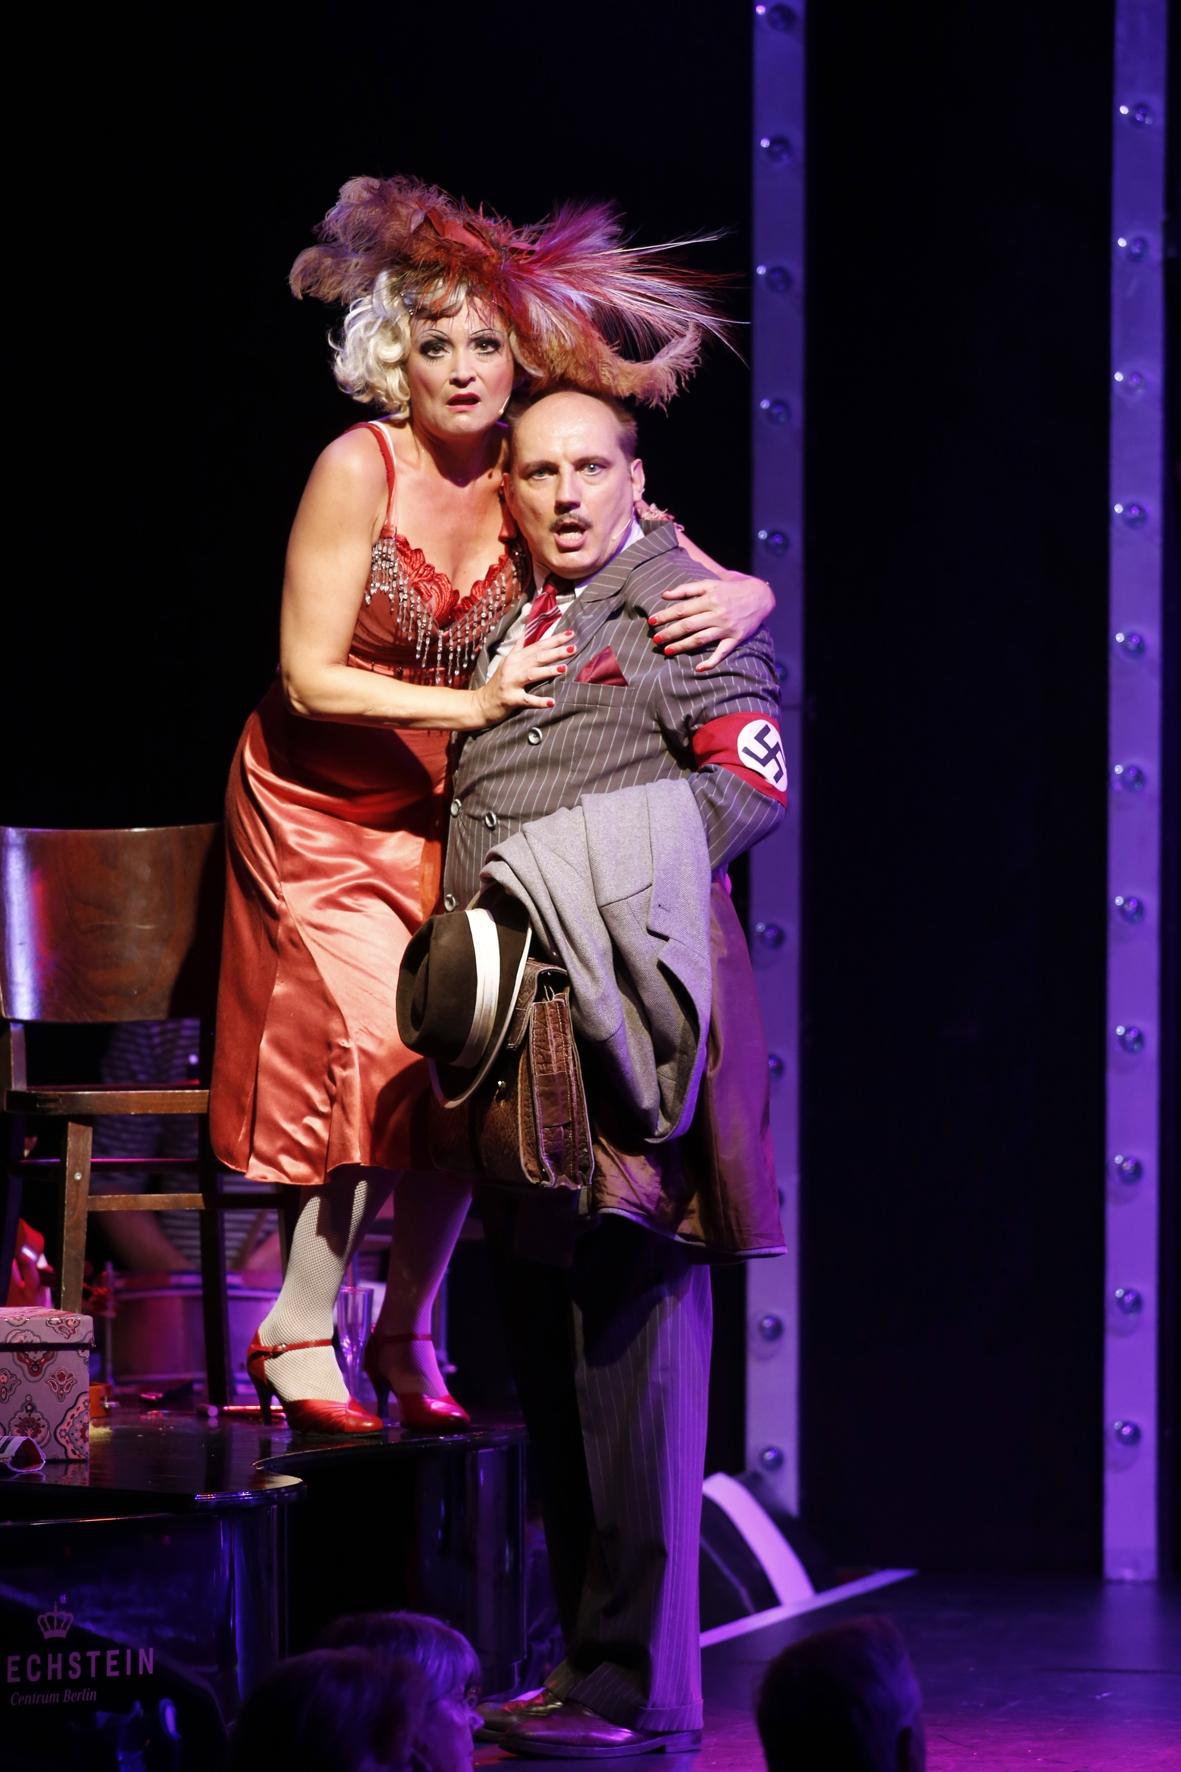 "Jacqueline Macaulay (Frl. Kost) and Romanus Fuhrmann (Ernst Ludwig) in ""Cabaret"" at Tipi am Kanzleramt. (Photo: Barbara Braun)"